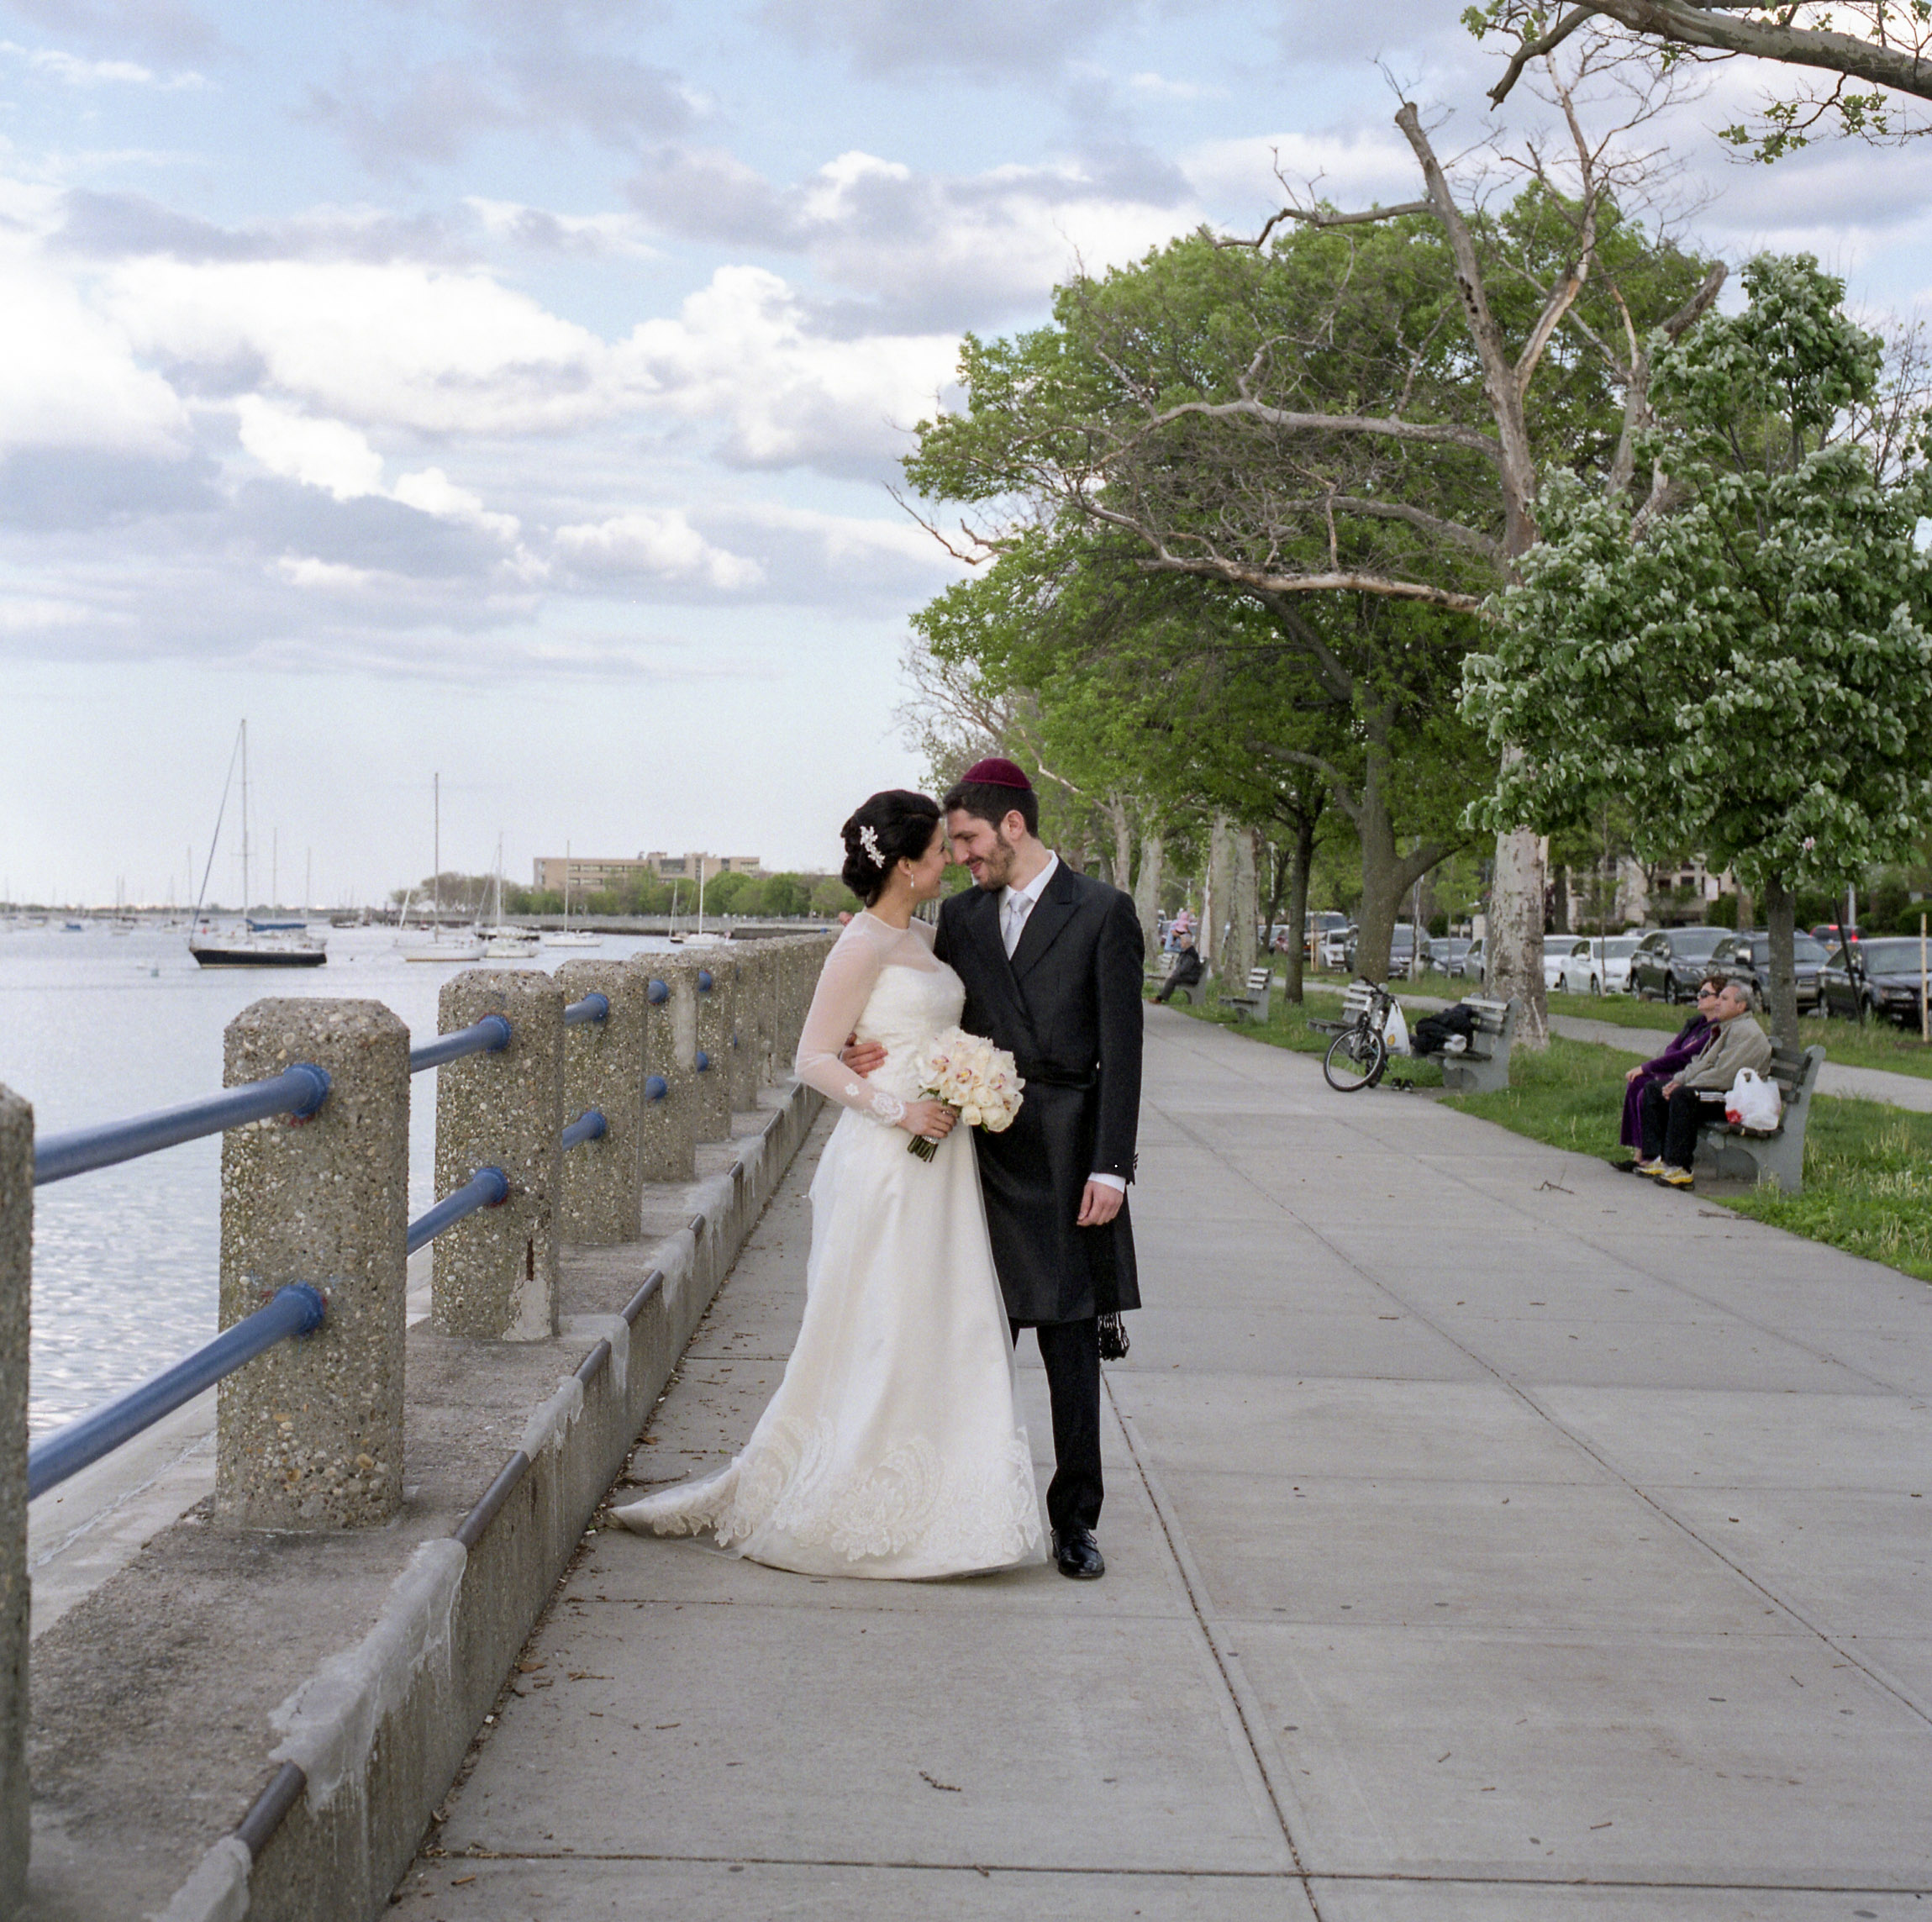 New-York-City-Hasidic-Jewish-Wedding-Manhattan-Beach-NYC-Photojournalistic-Wedding-Photography-Jacek-Dolata-35mm-medium-format-film-28.jpg